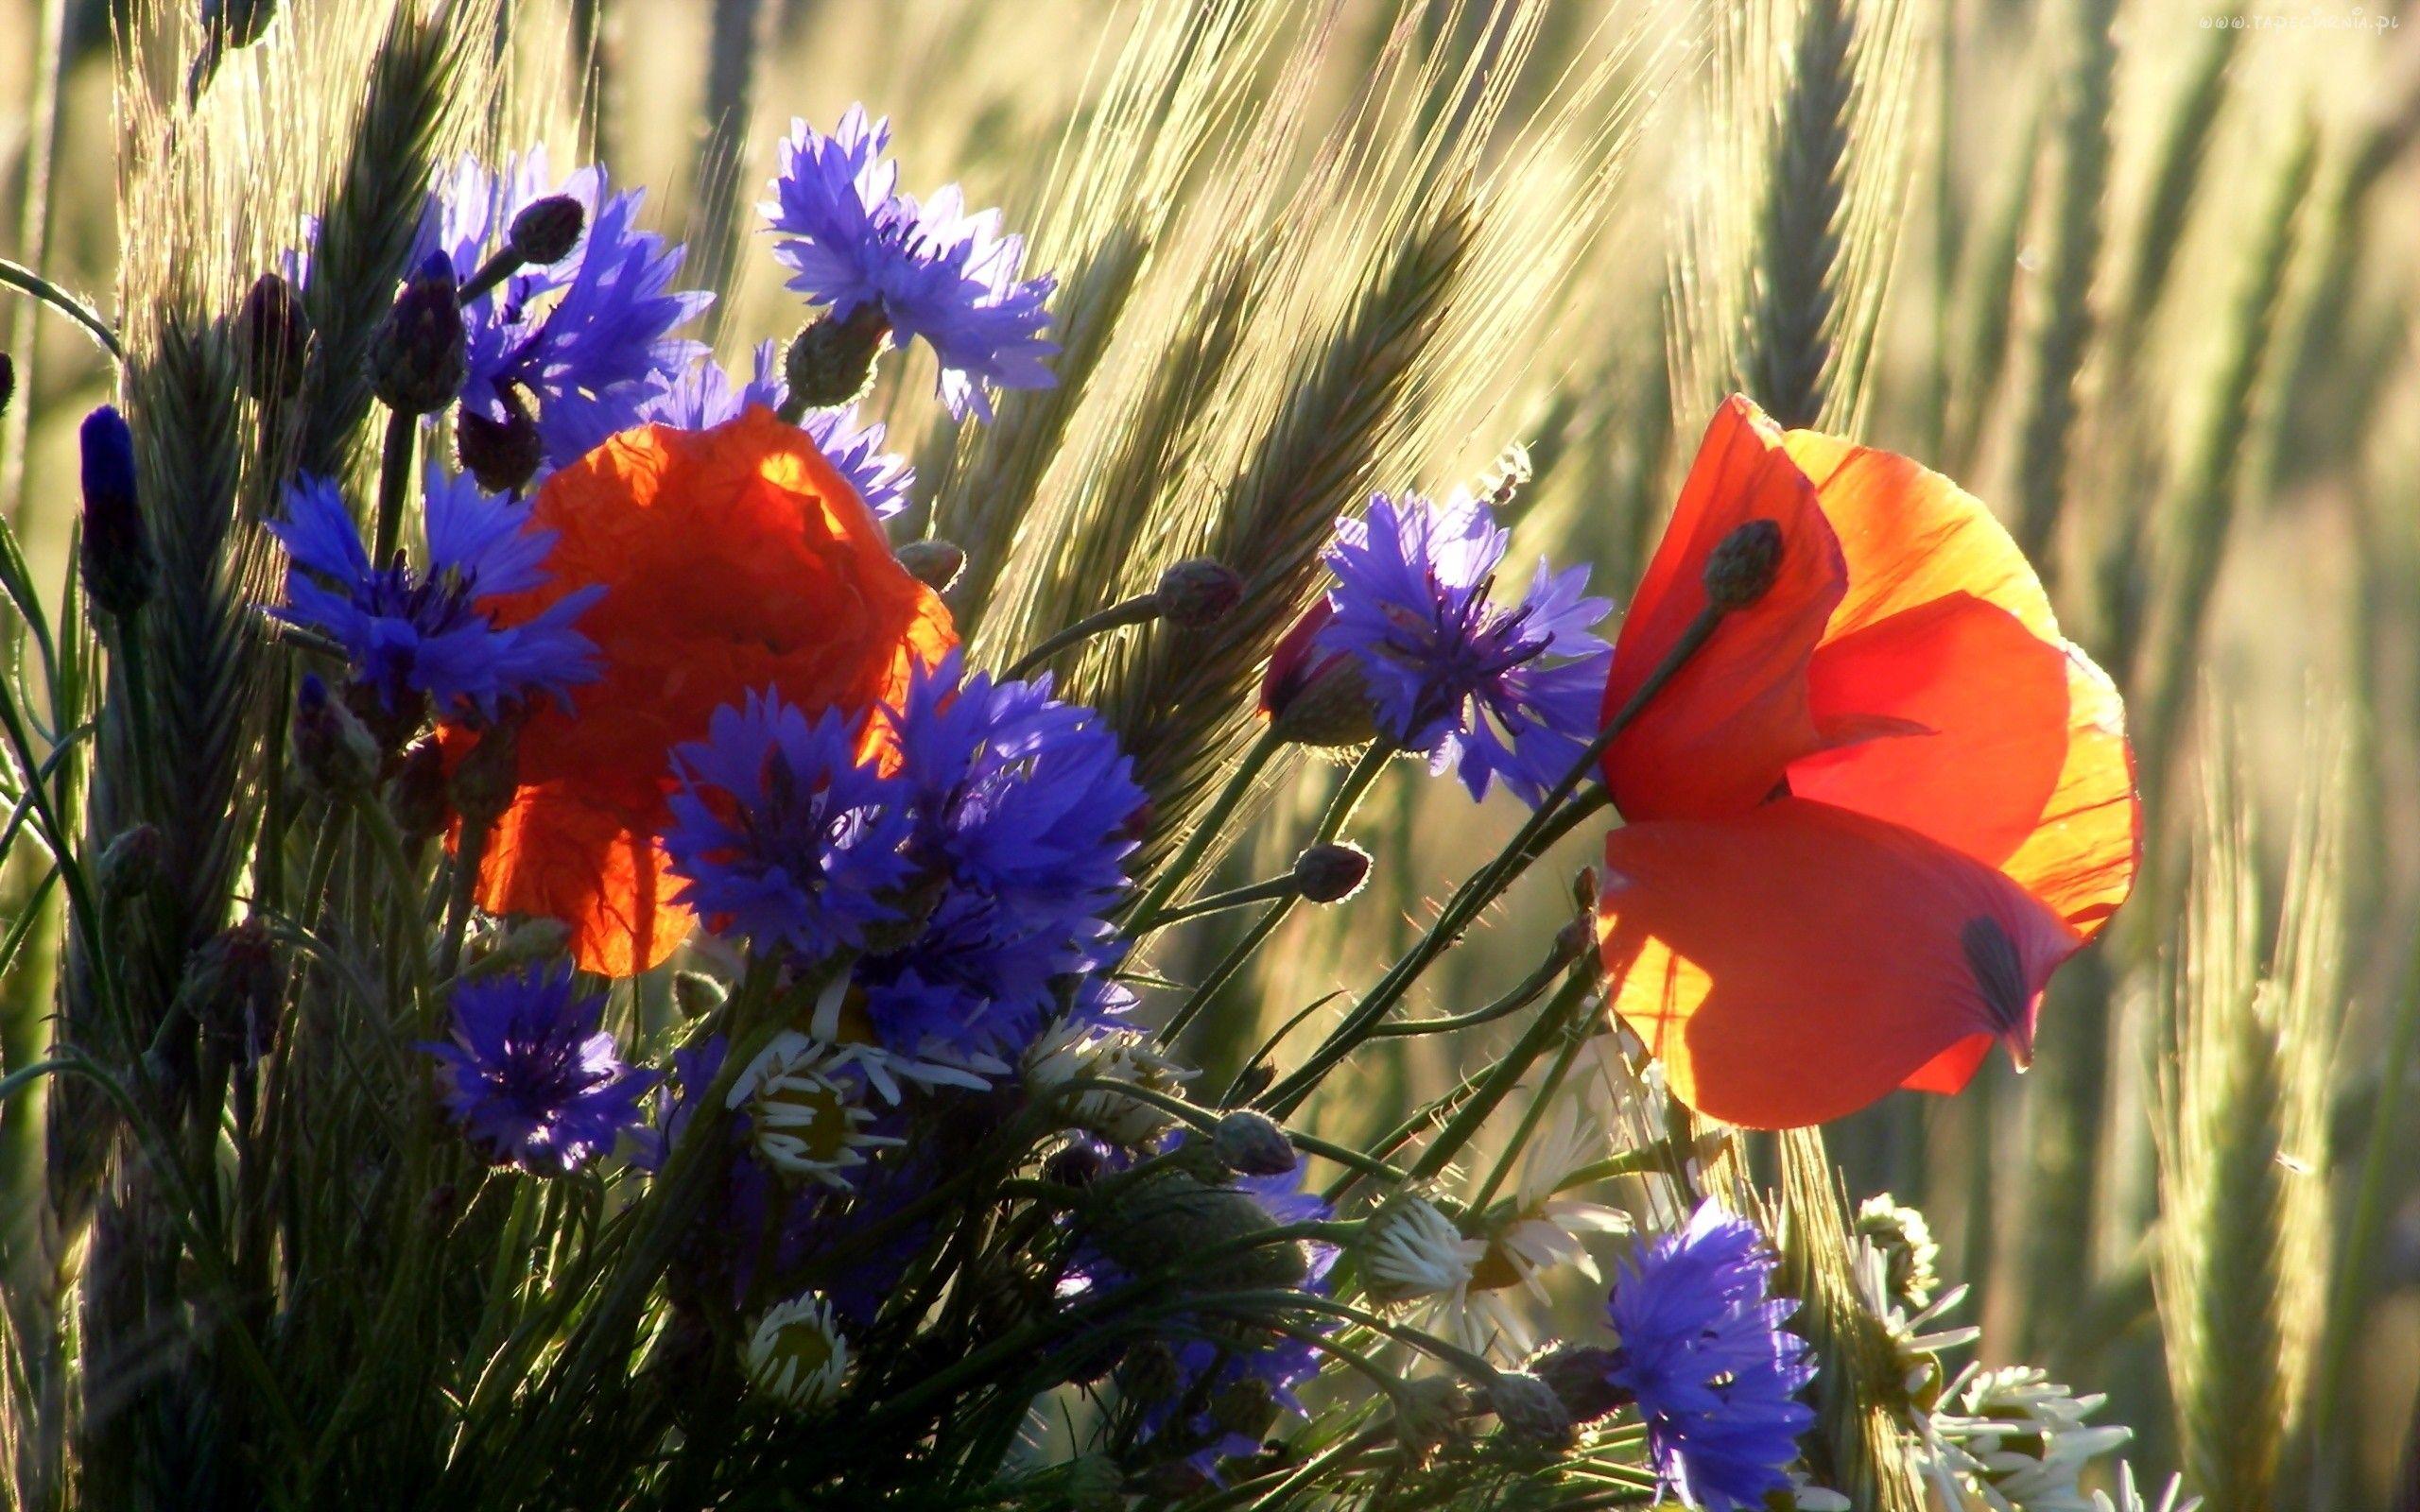 Laka Kwiaty Chabry Maki Purple Flowers Garden Wild Flowers Poppies